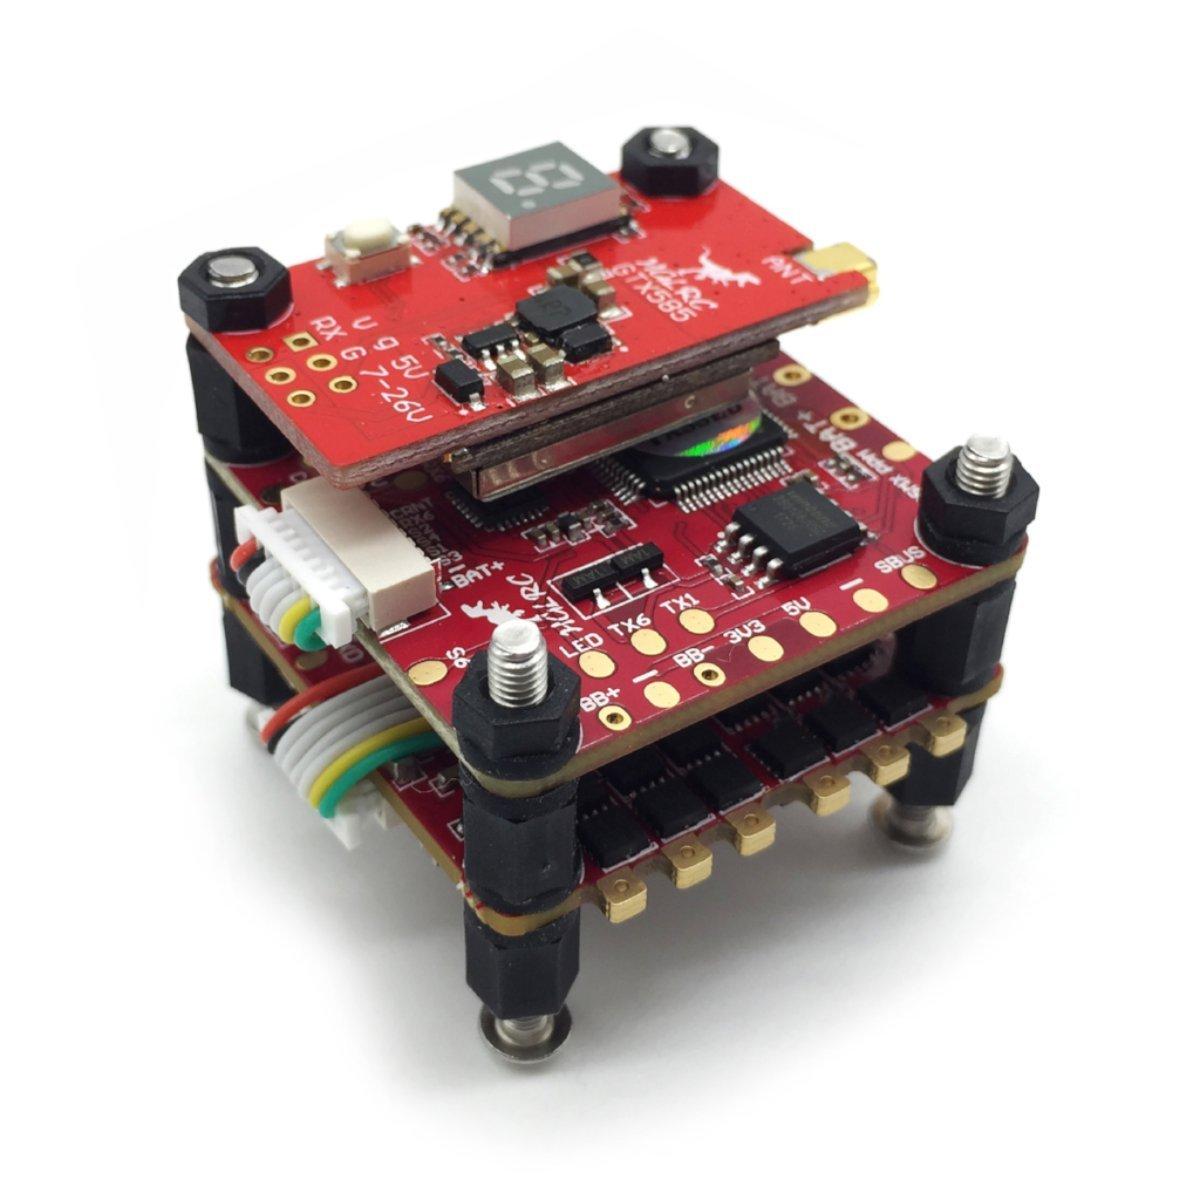 HGLRC Titan Plus F460-GTX585 pile AIRBUS F4OSD contrôleur de vol Dinoshot 60A Blheli_32 3-6 S ESC GTX585 VTX FPV transmetteur